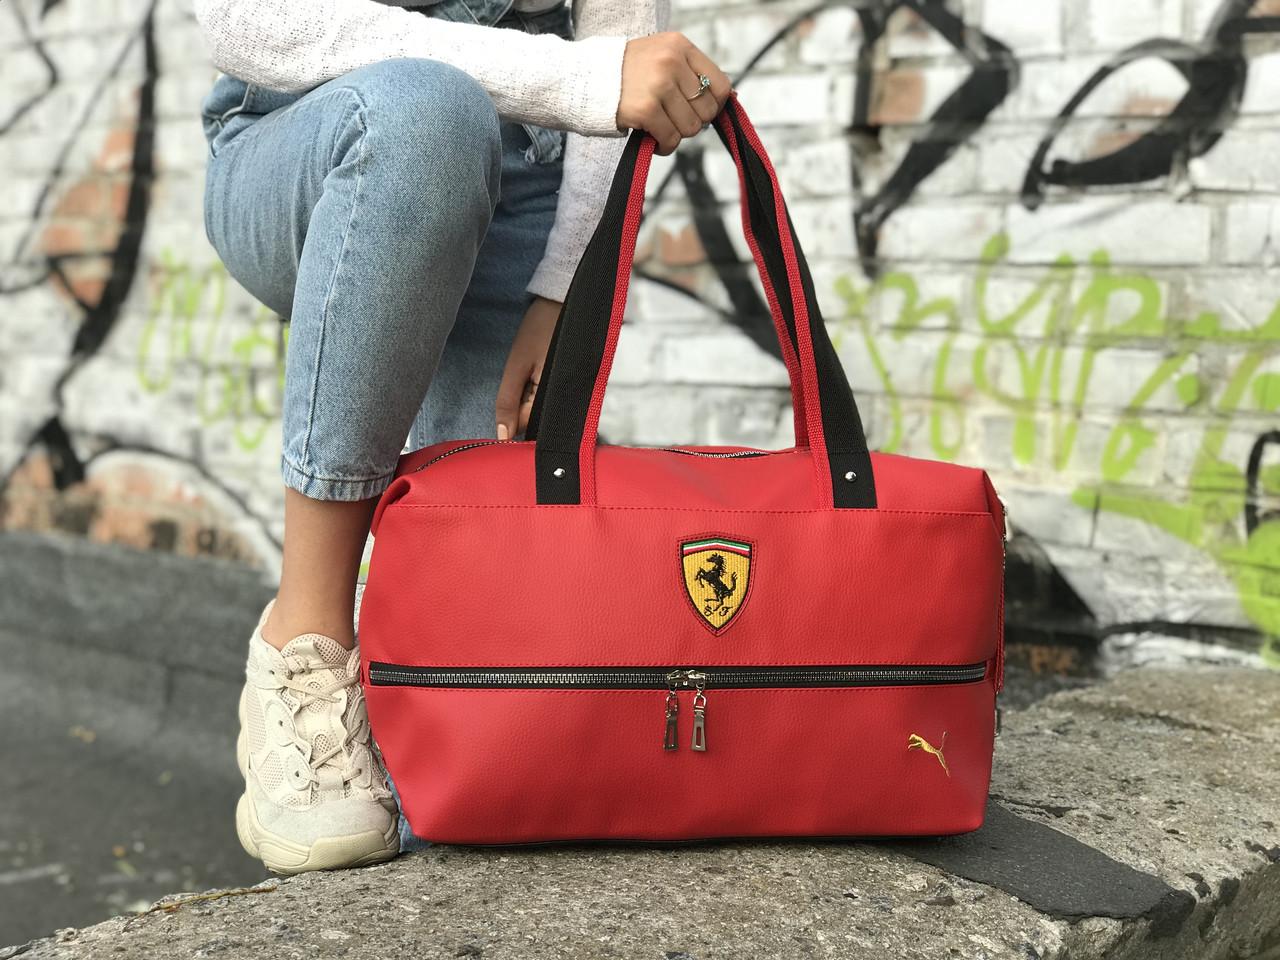 Спортивная сумка Puma Ferrari, красная